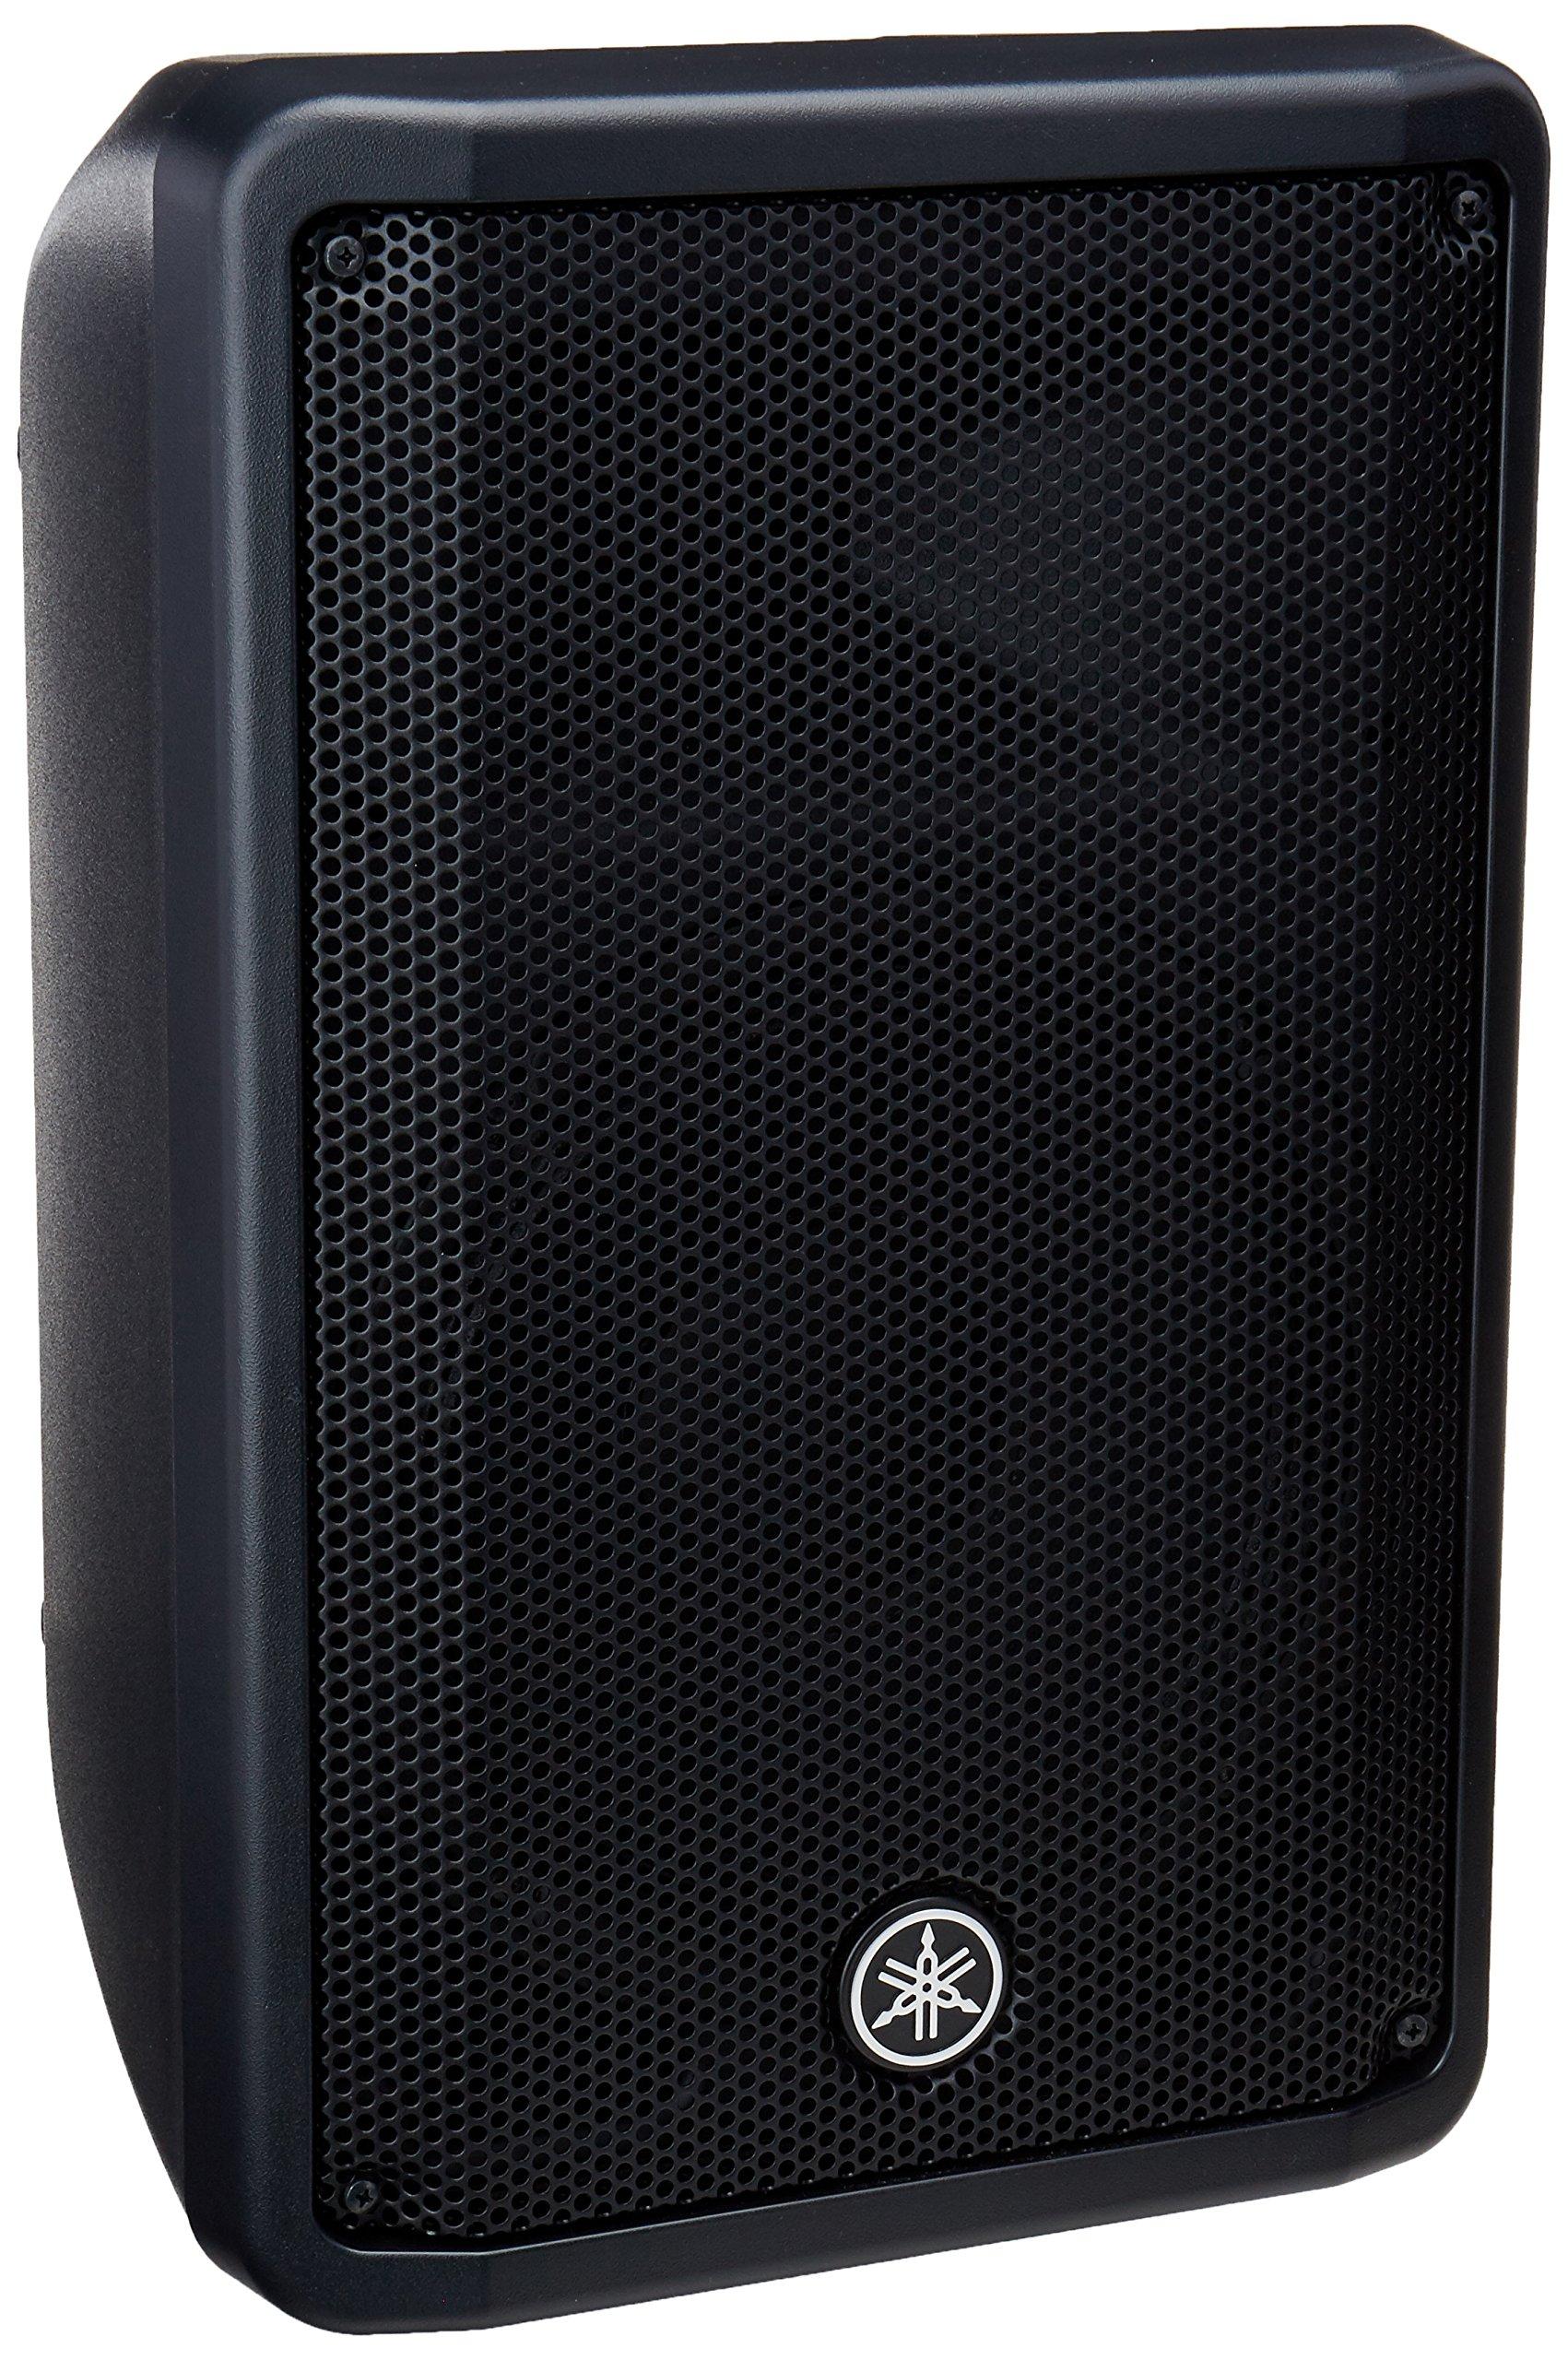 Yamaha CBR10 10 inch Passive Loudspeaker